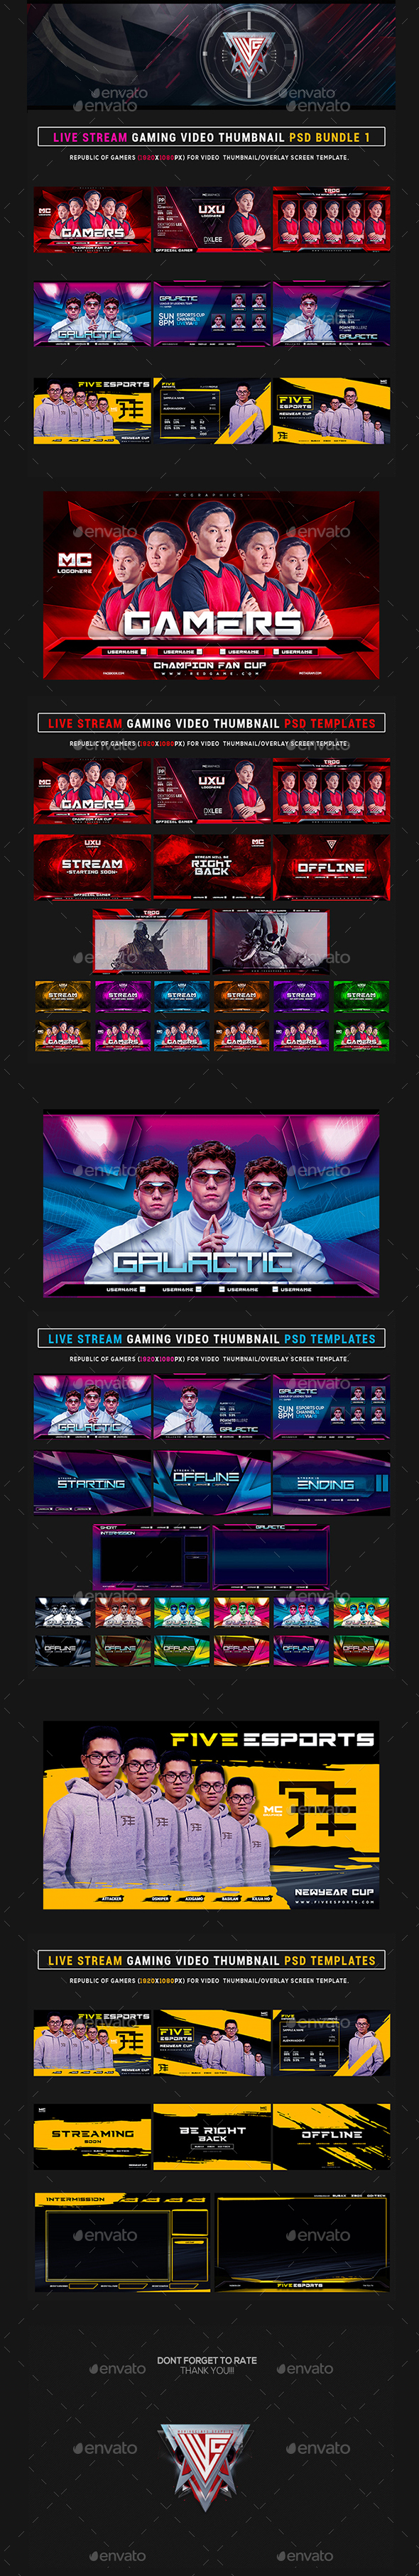 Esports Social Media Stream Gaming Video Thumbnail / Banner Overlay Photoshop Templates Bundle 1